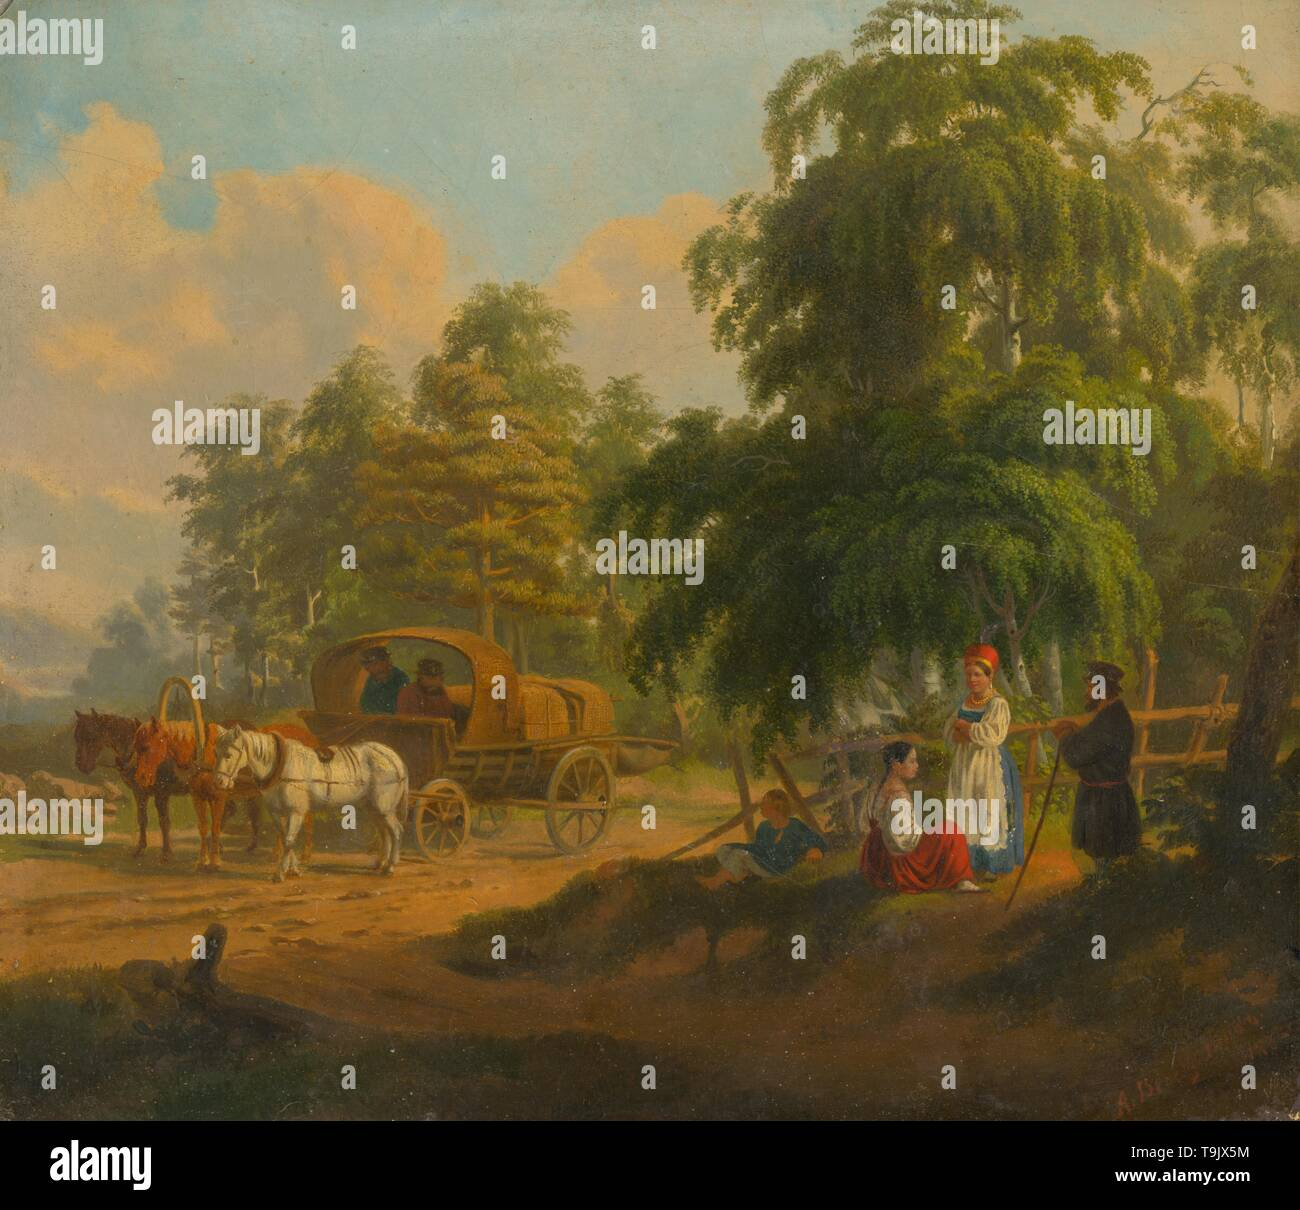 Landscape with Russian Troika. Museum: Slovak National Gallery, Bratislava. Author: Alexei Gavrilovich Venetsianov. - Stock Image